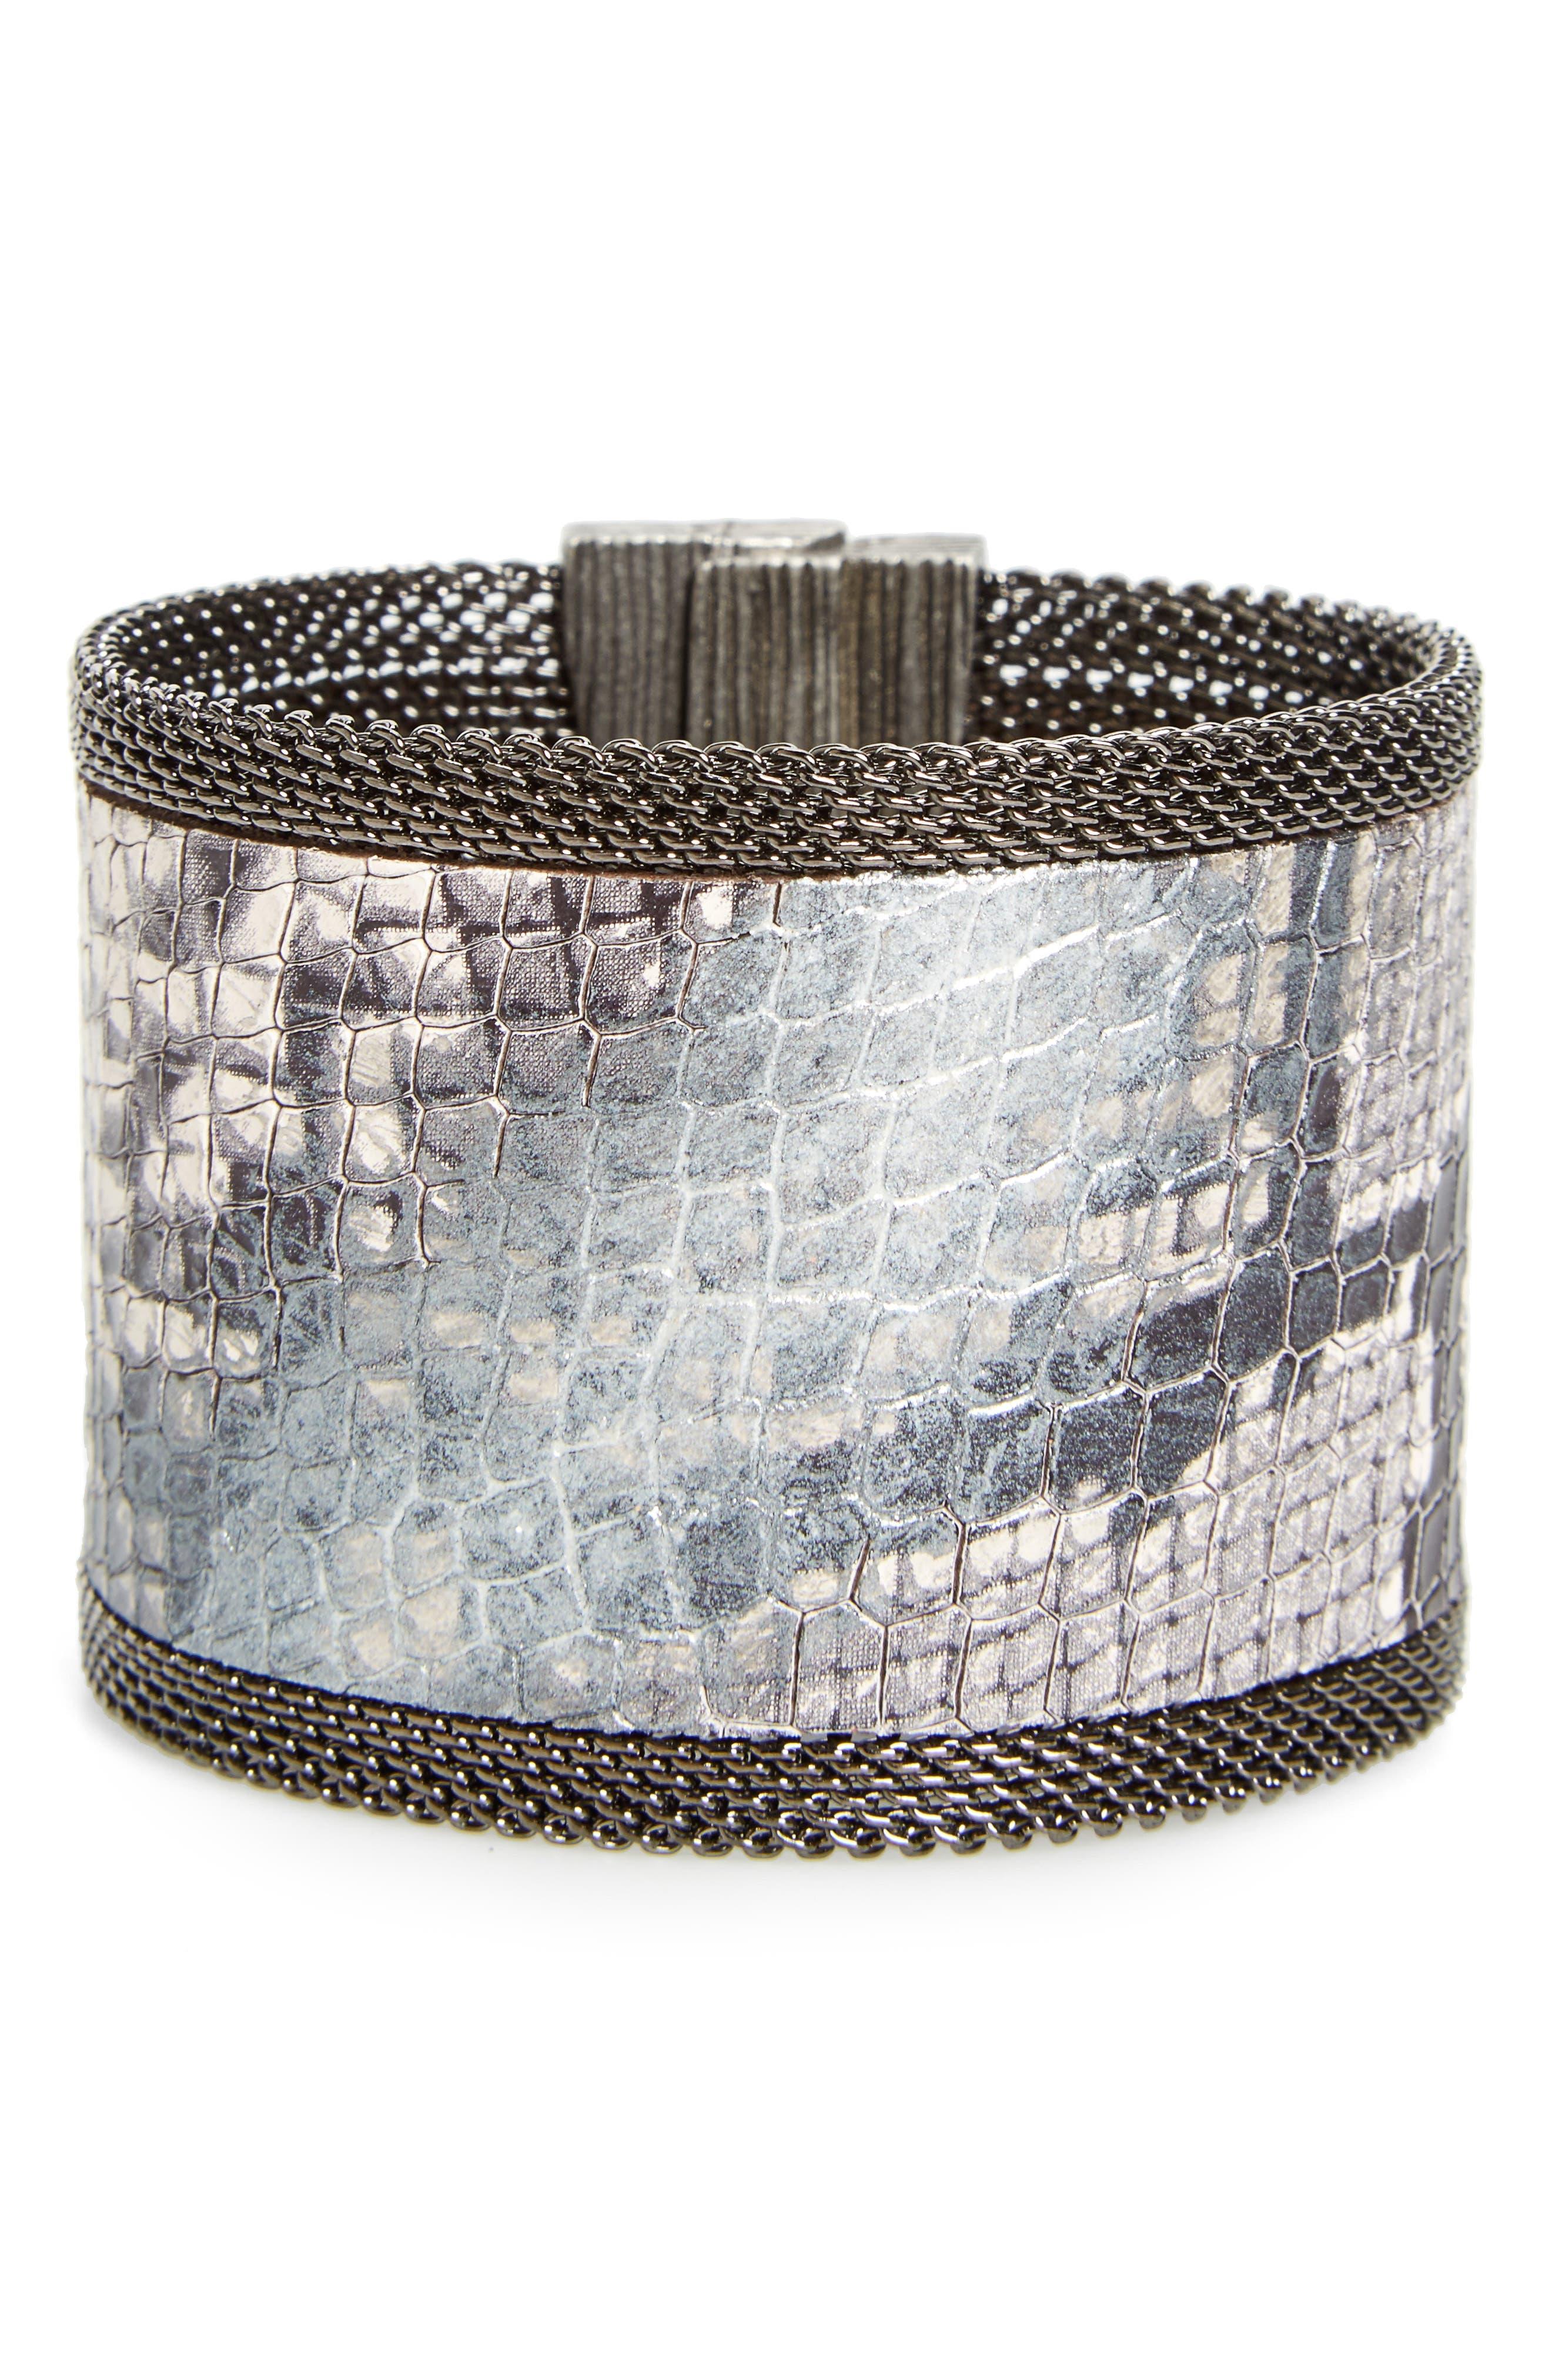 CYNTHIA DESSER Genuine Snakeskin Cuff